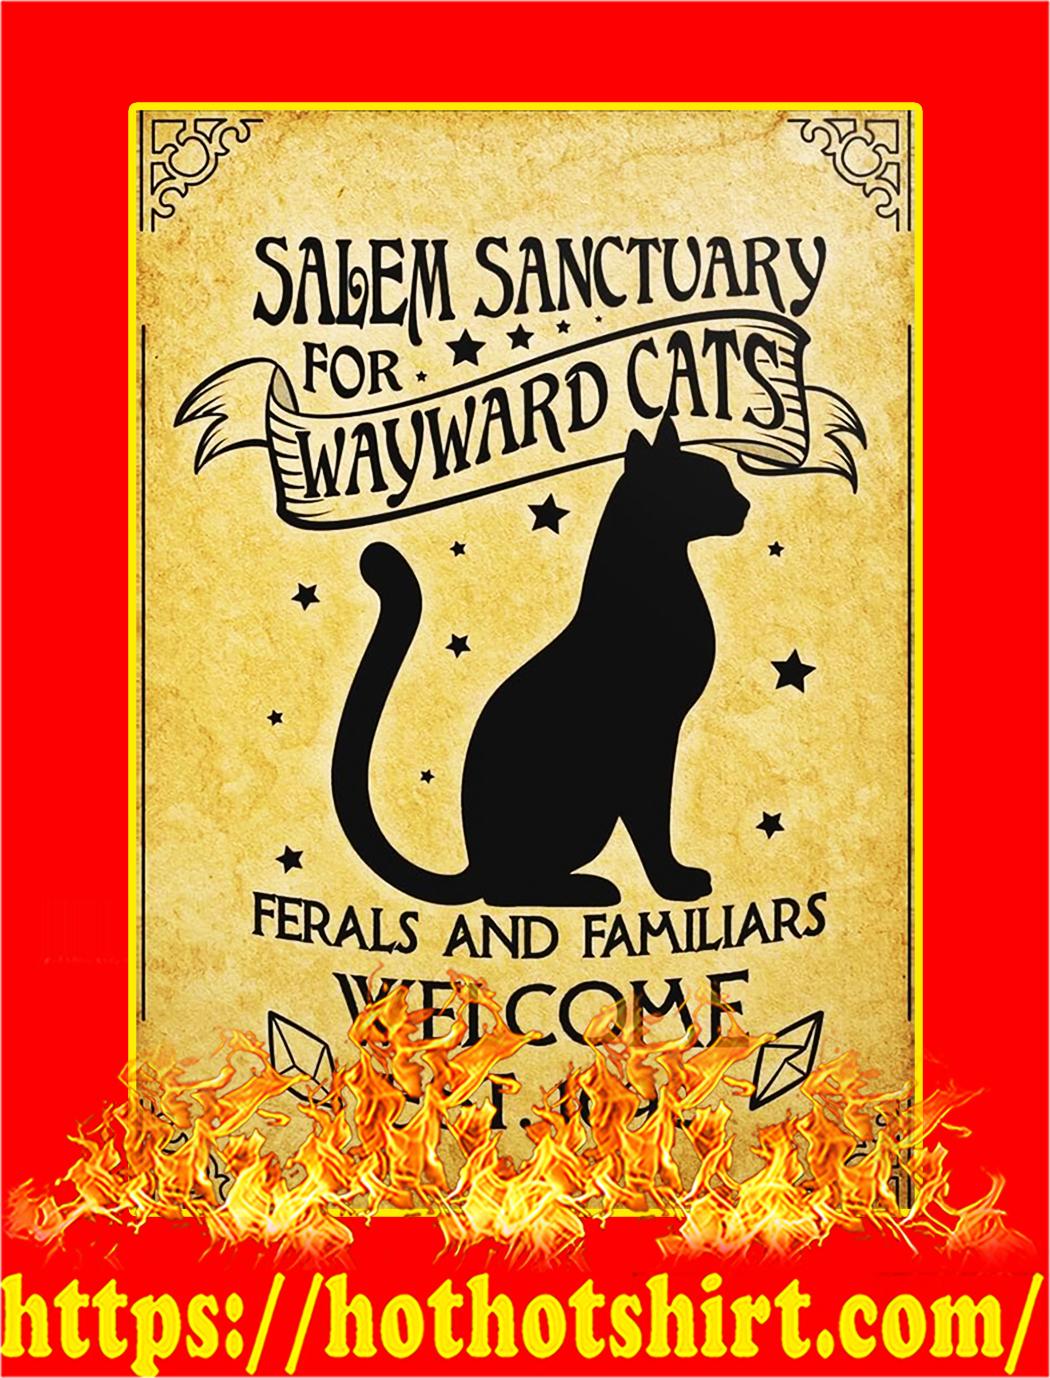 Salem Sanctuary For Wayward Cats Poster - A1